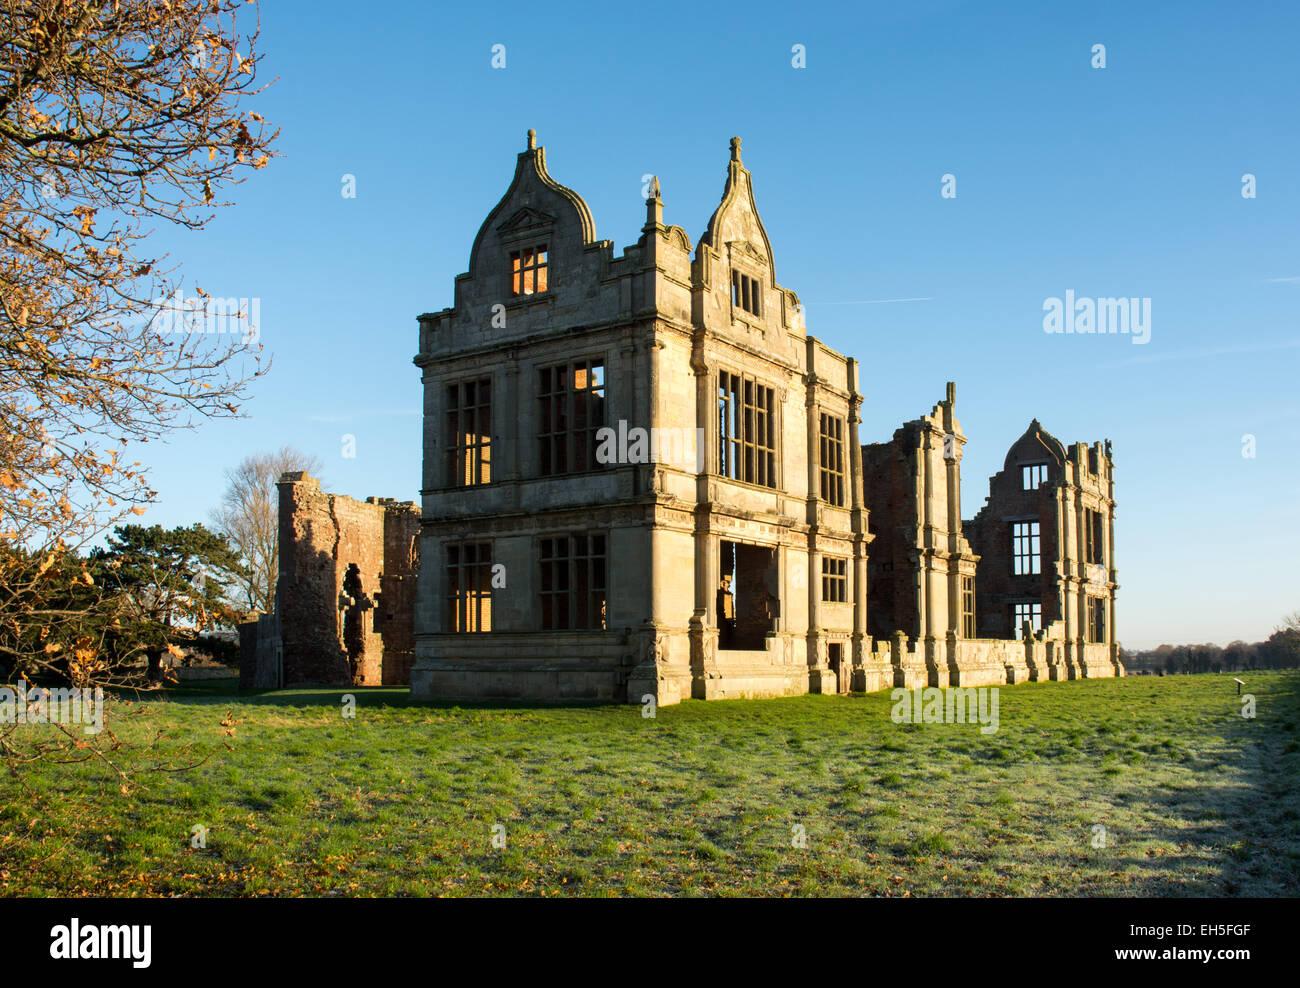 Moreton Corbet Castle, Shropshire, in winter sunshine - Stock Image